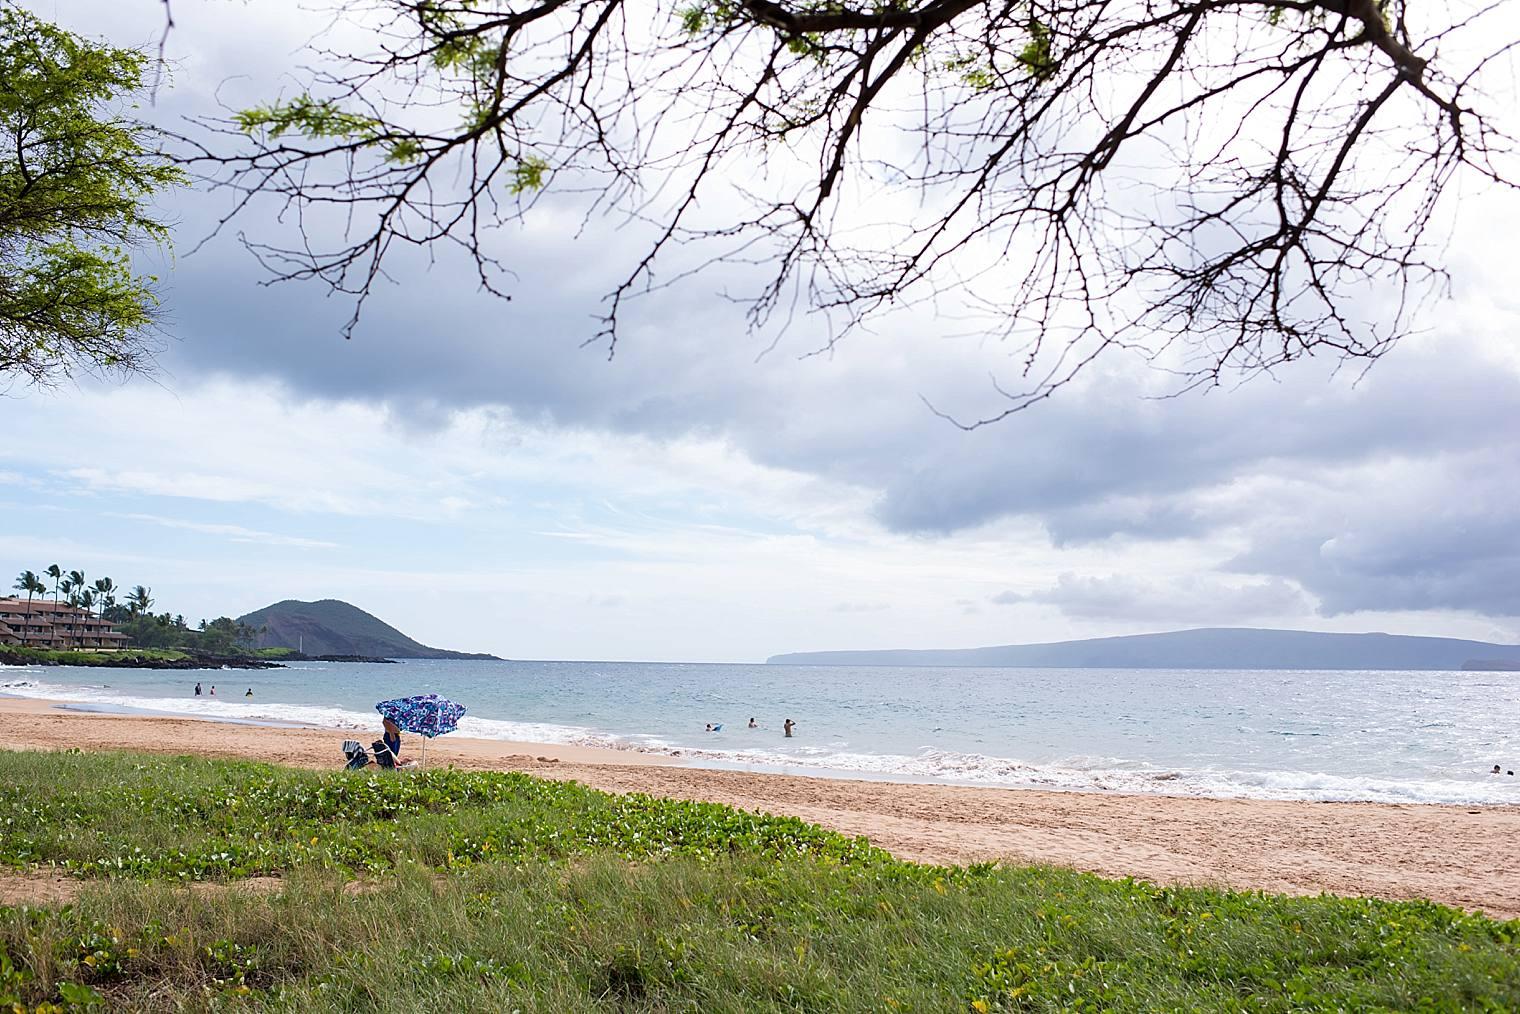 Chang's Beach in Maui, Hawaii